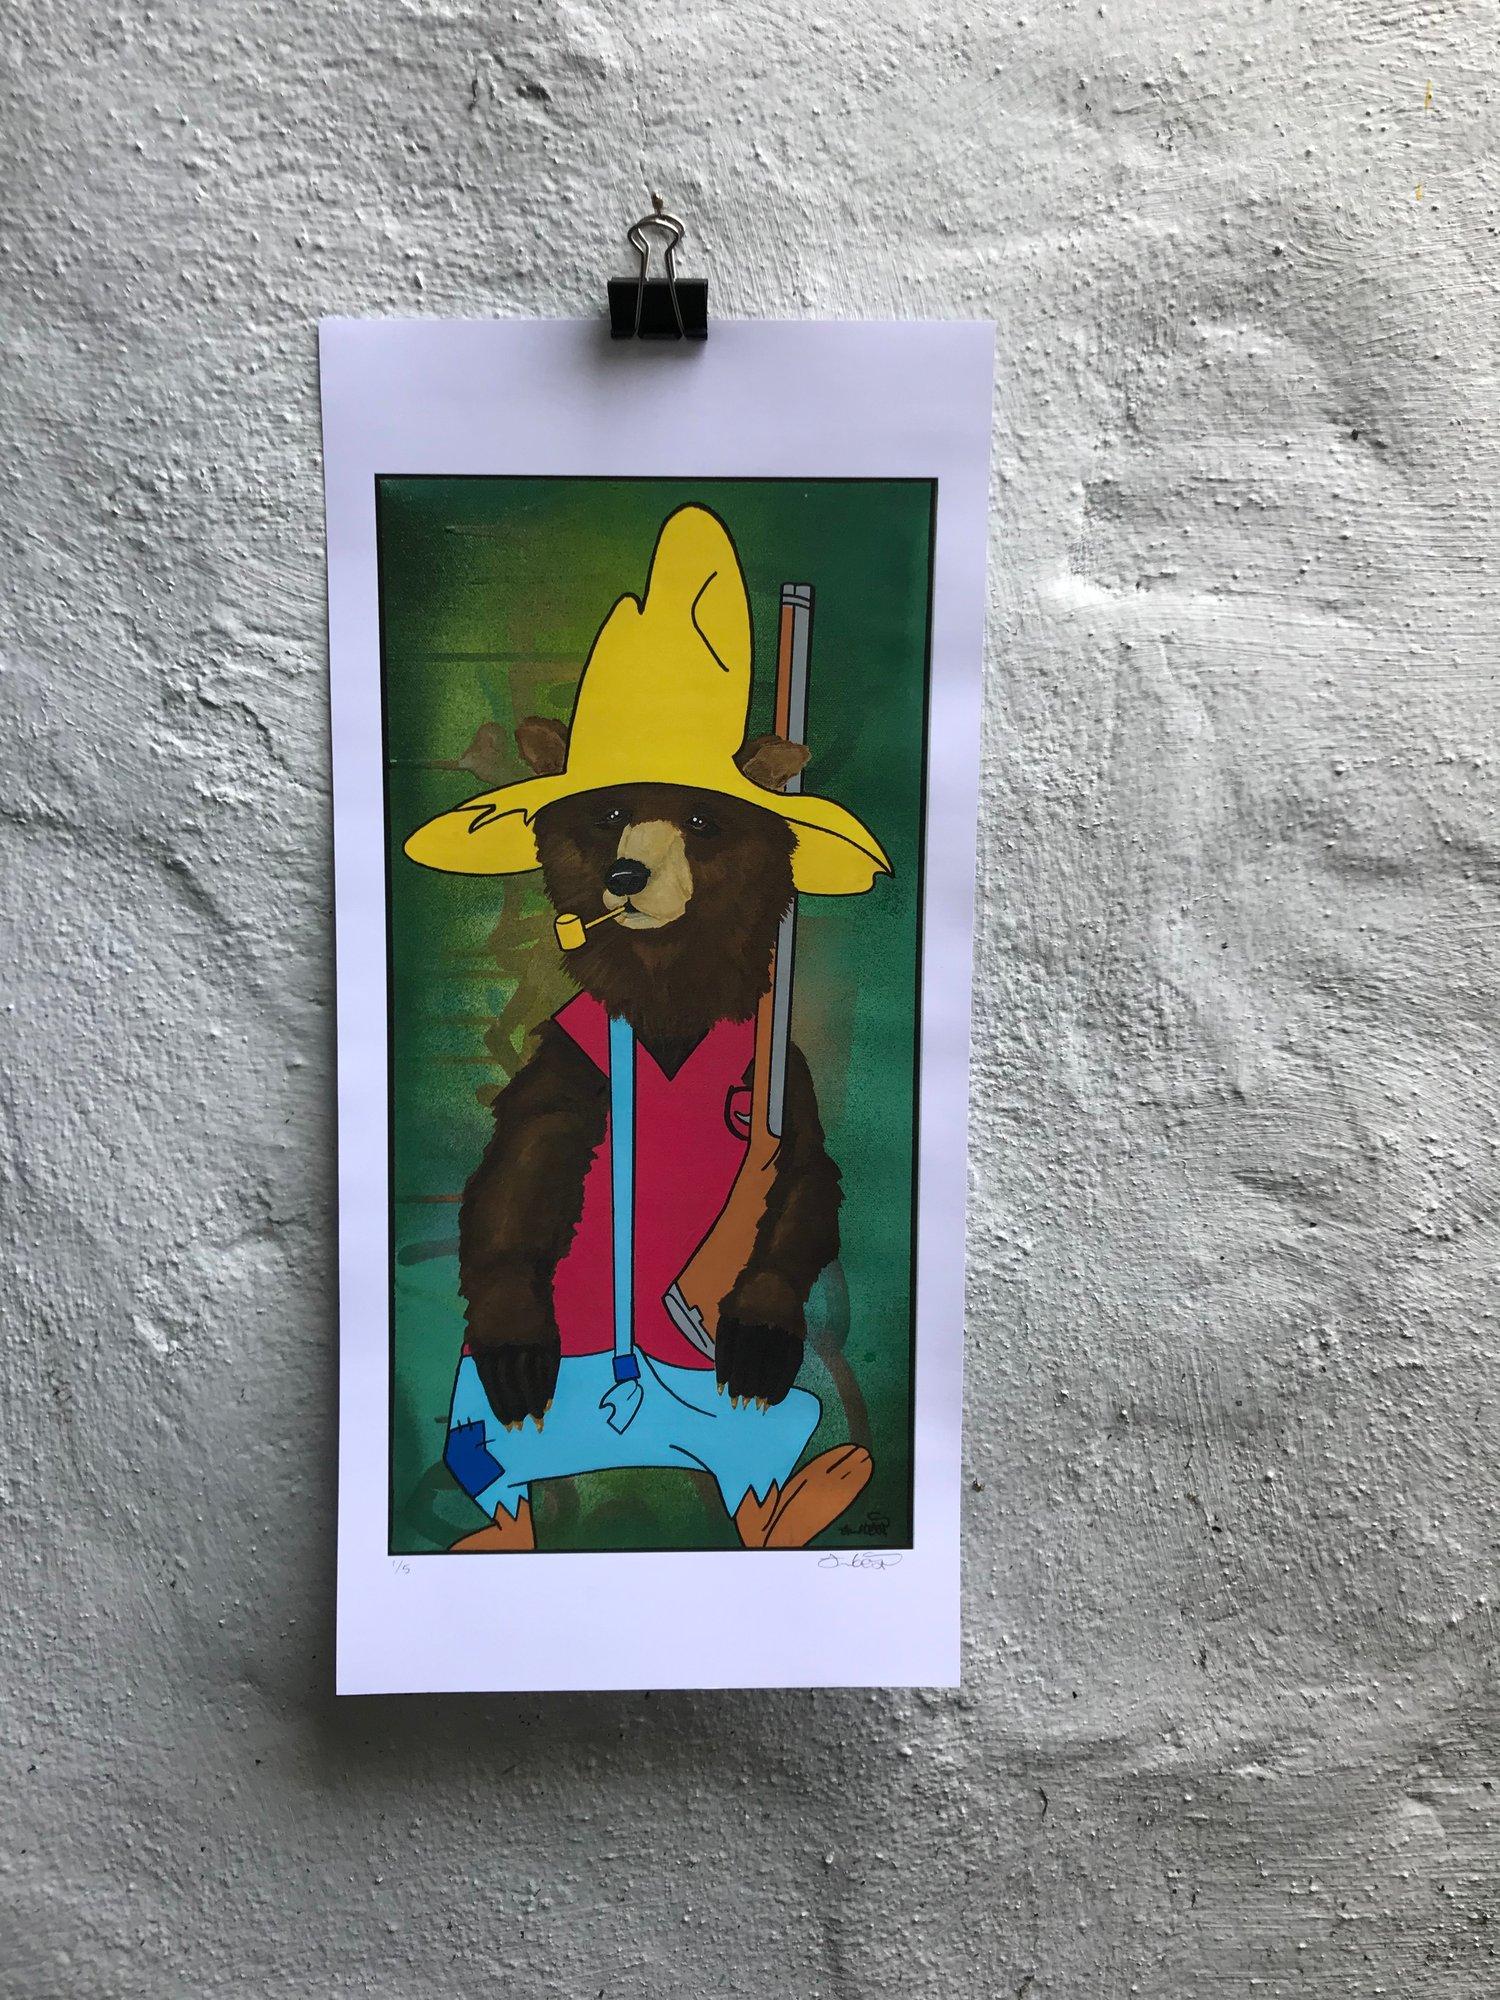 Image of @bear_2.1.5 PAW RUGG print